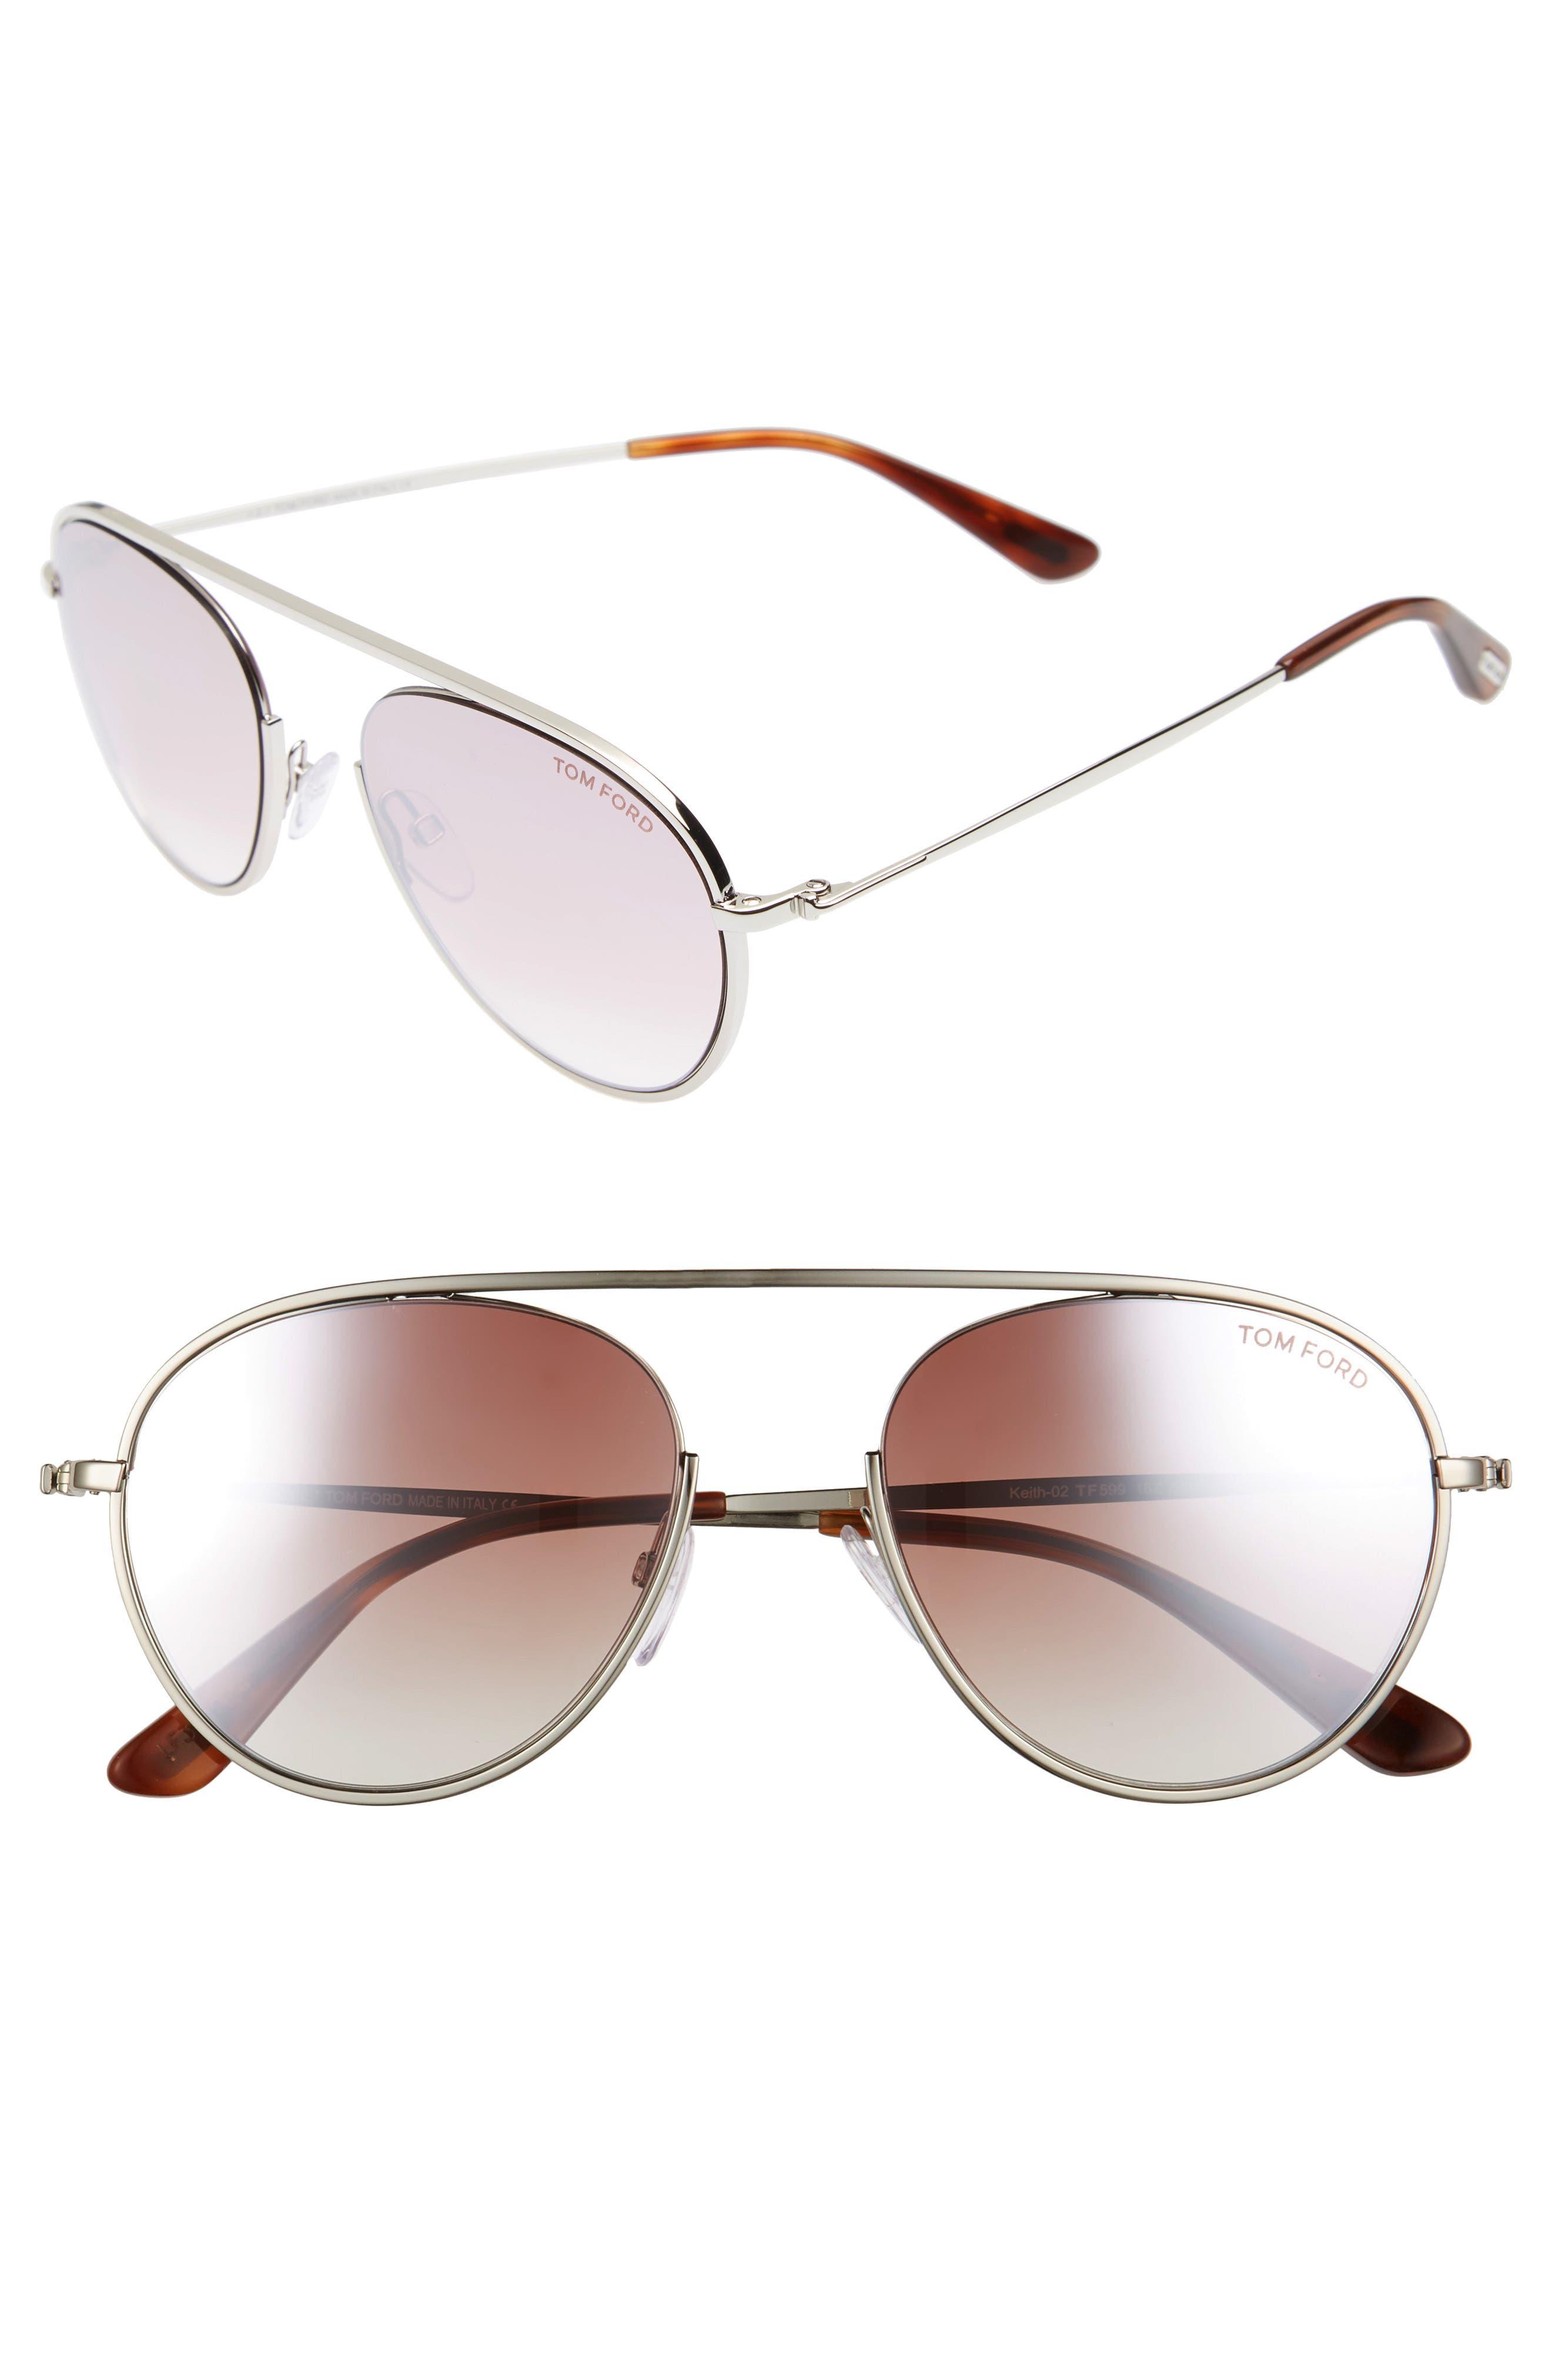 Keith 55mm Metal Aviator Sunglasses,                         Main,                         color, 040